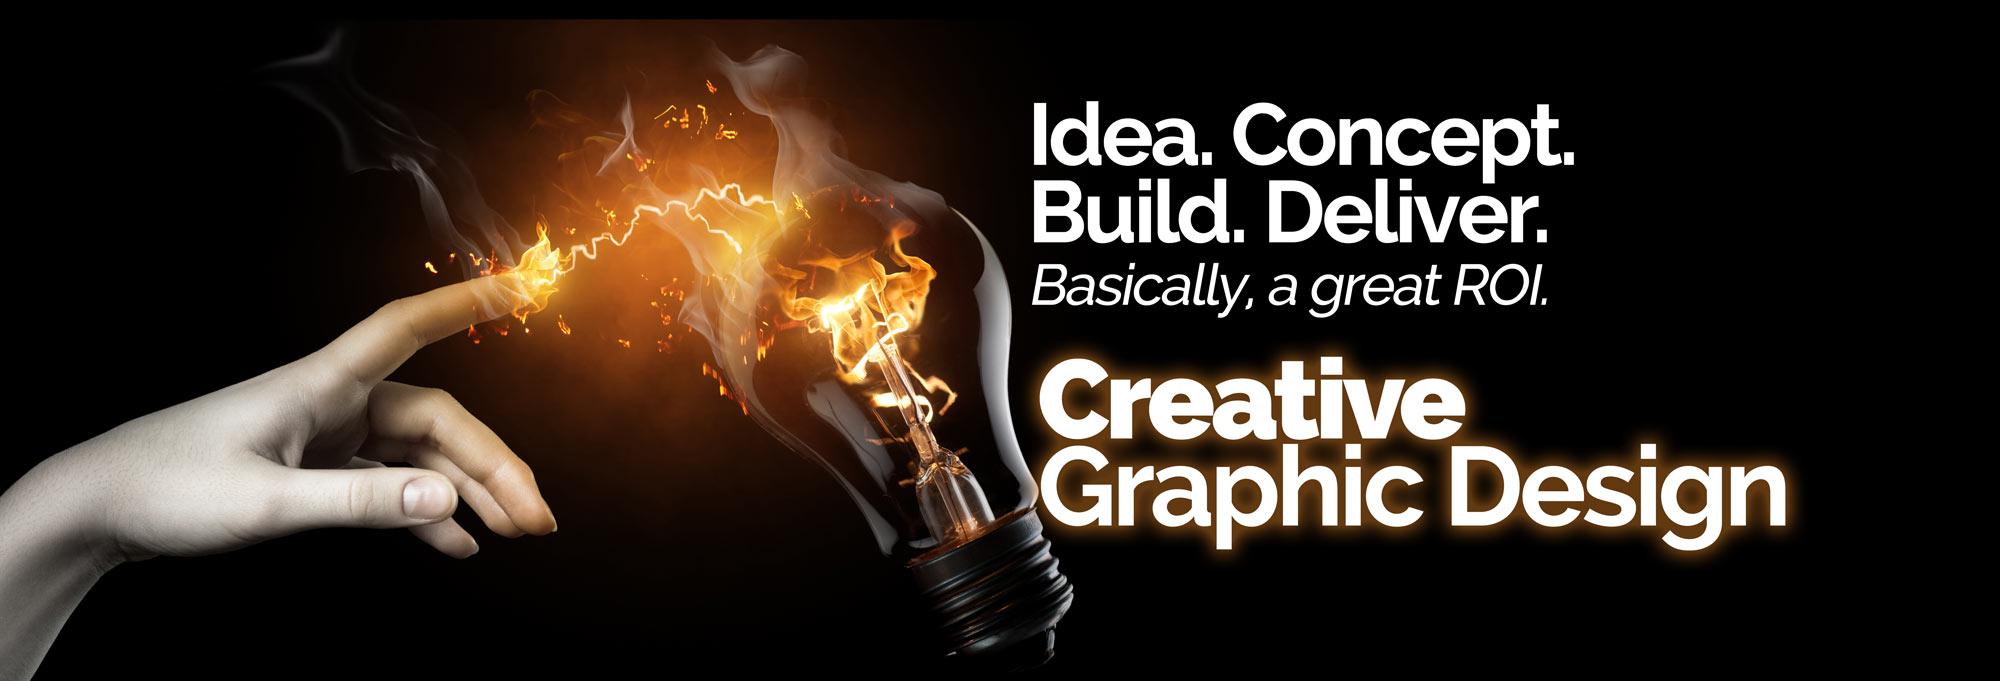 graphic design and artwork